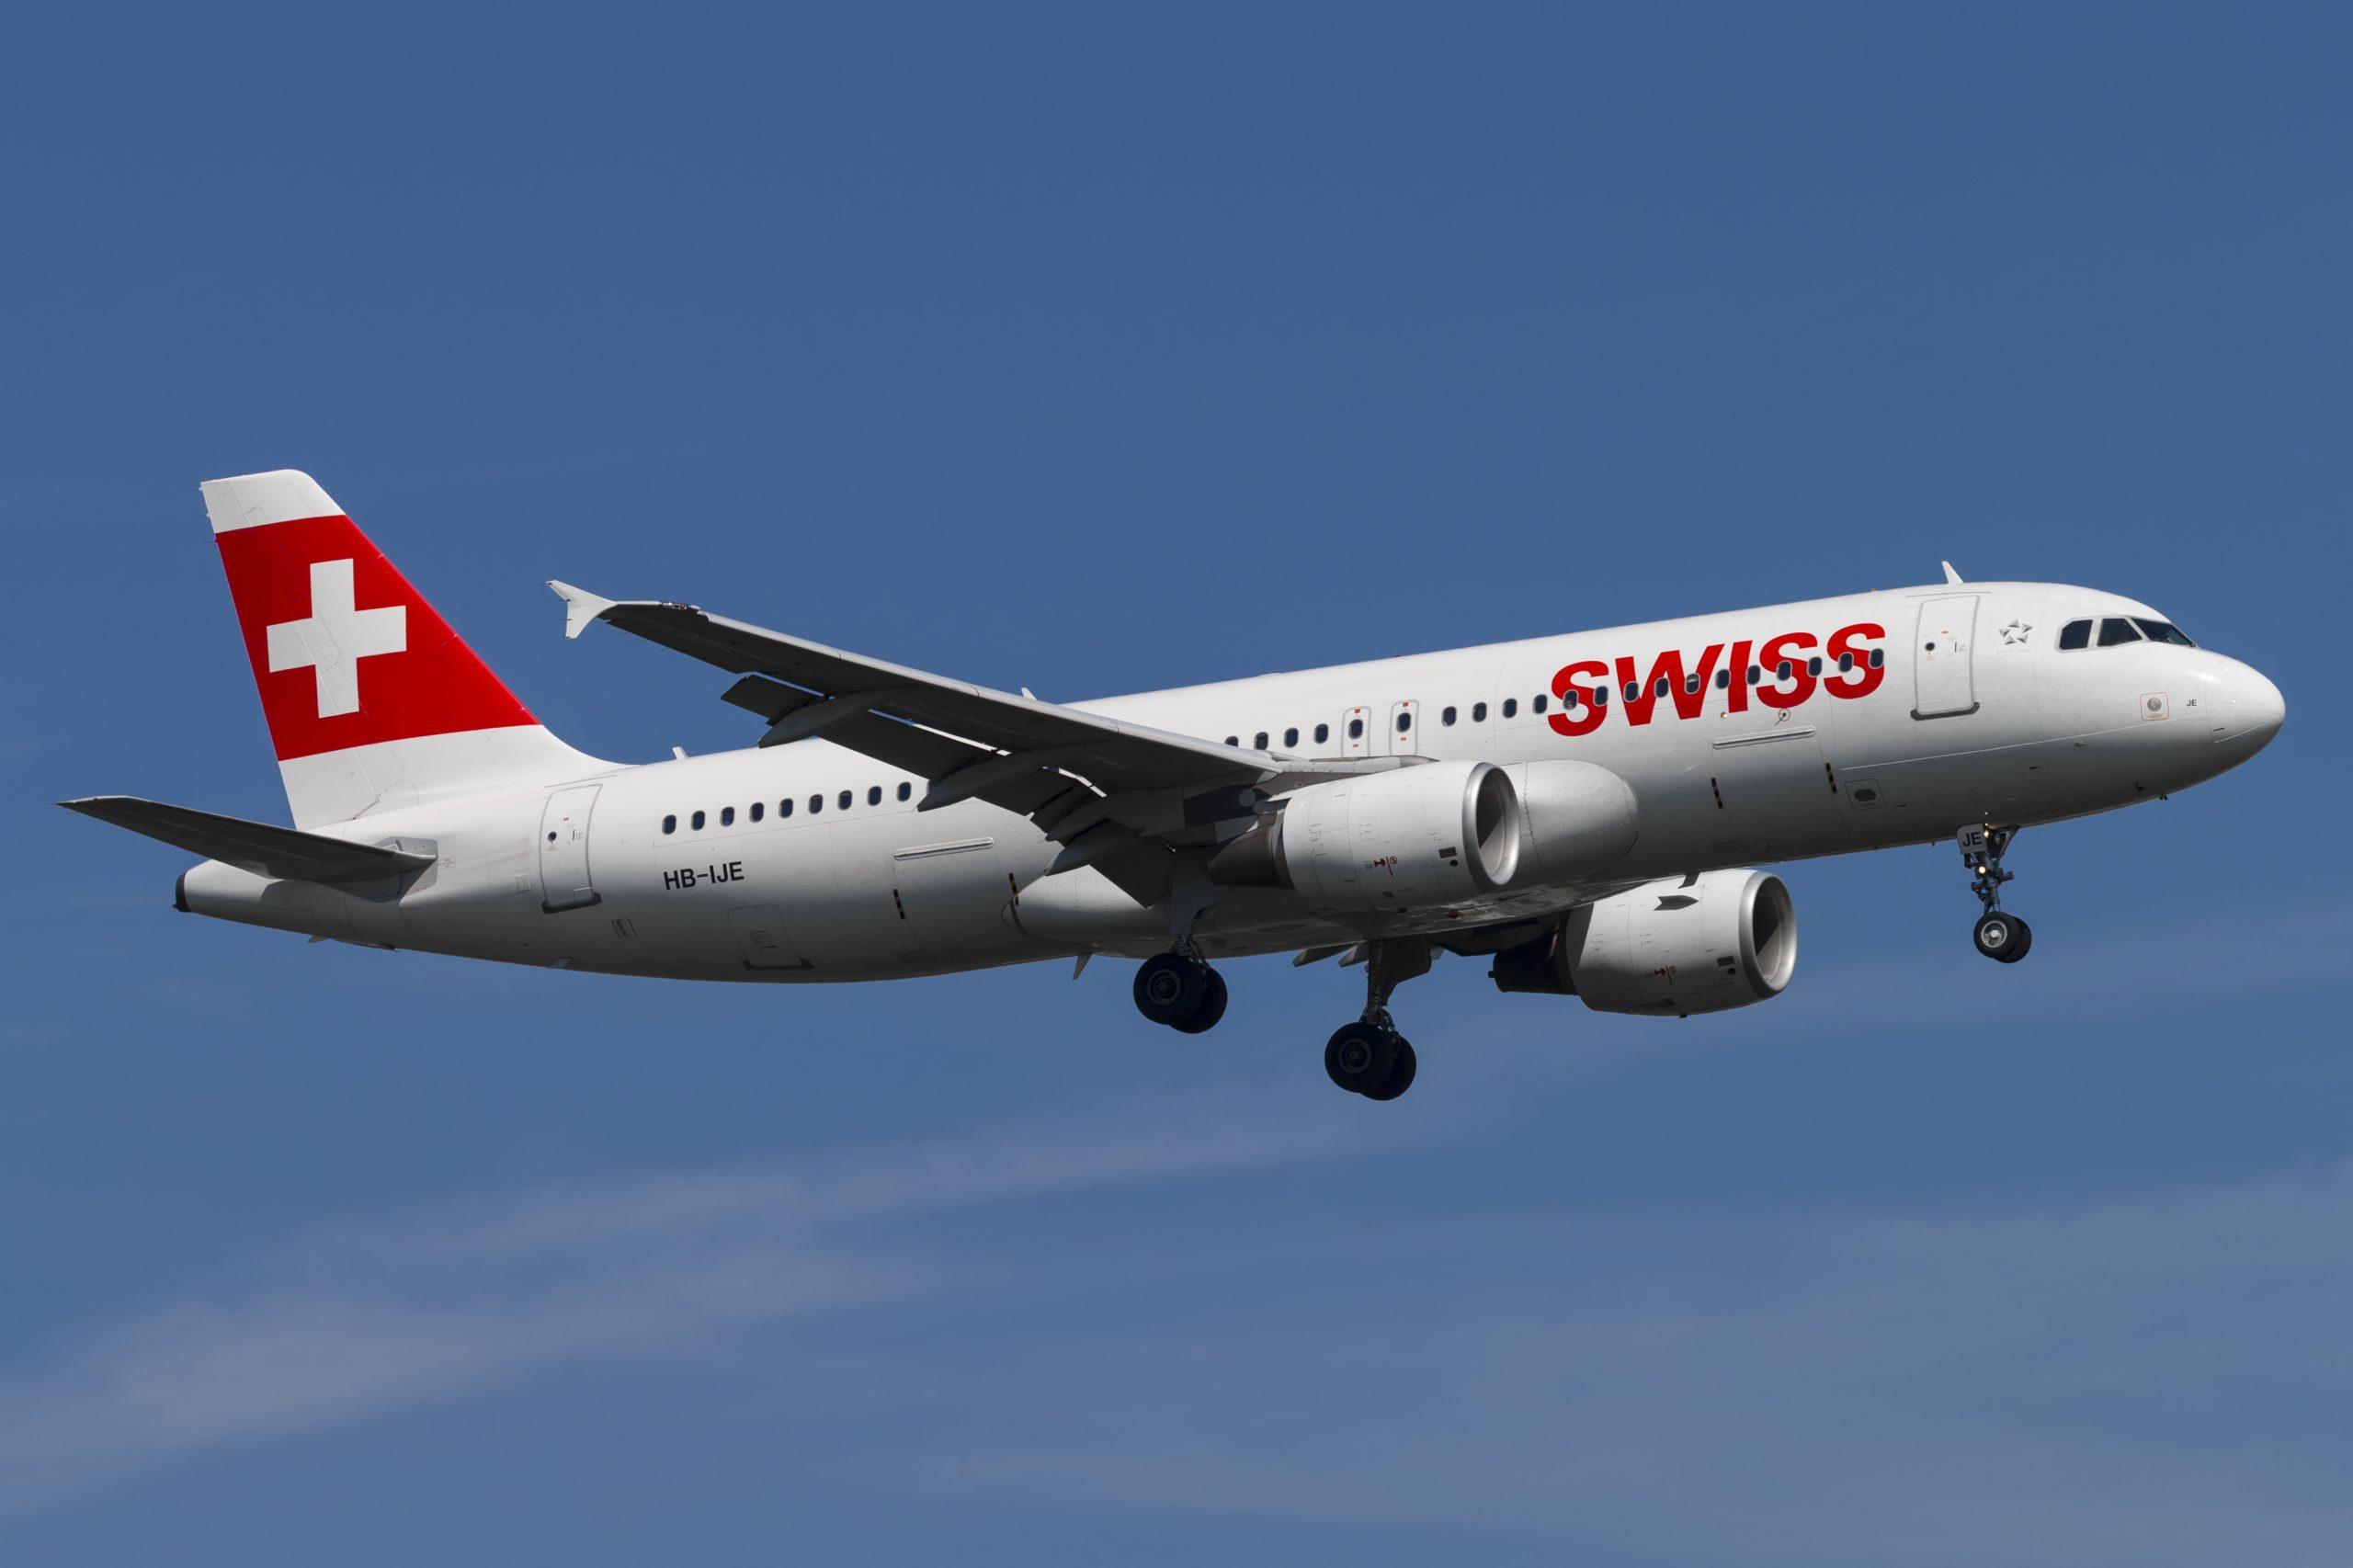 En Airbus A320-200 fra SWISS. Foto: © Thorbjørn Brunander Sund, Danish Aviation Photo